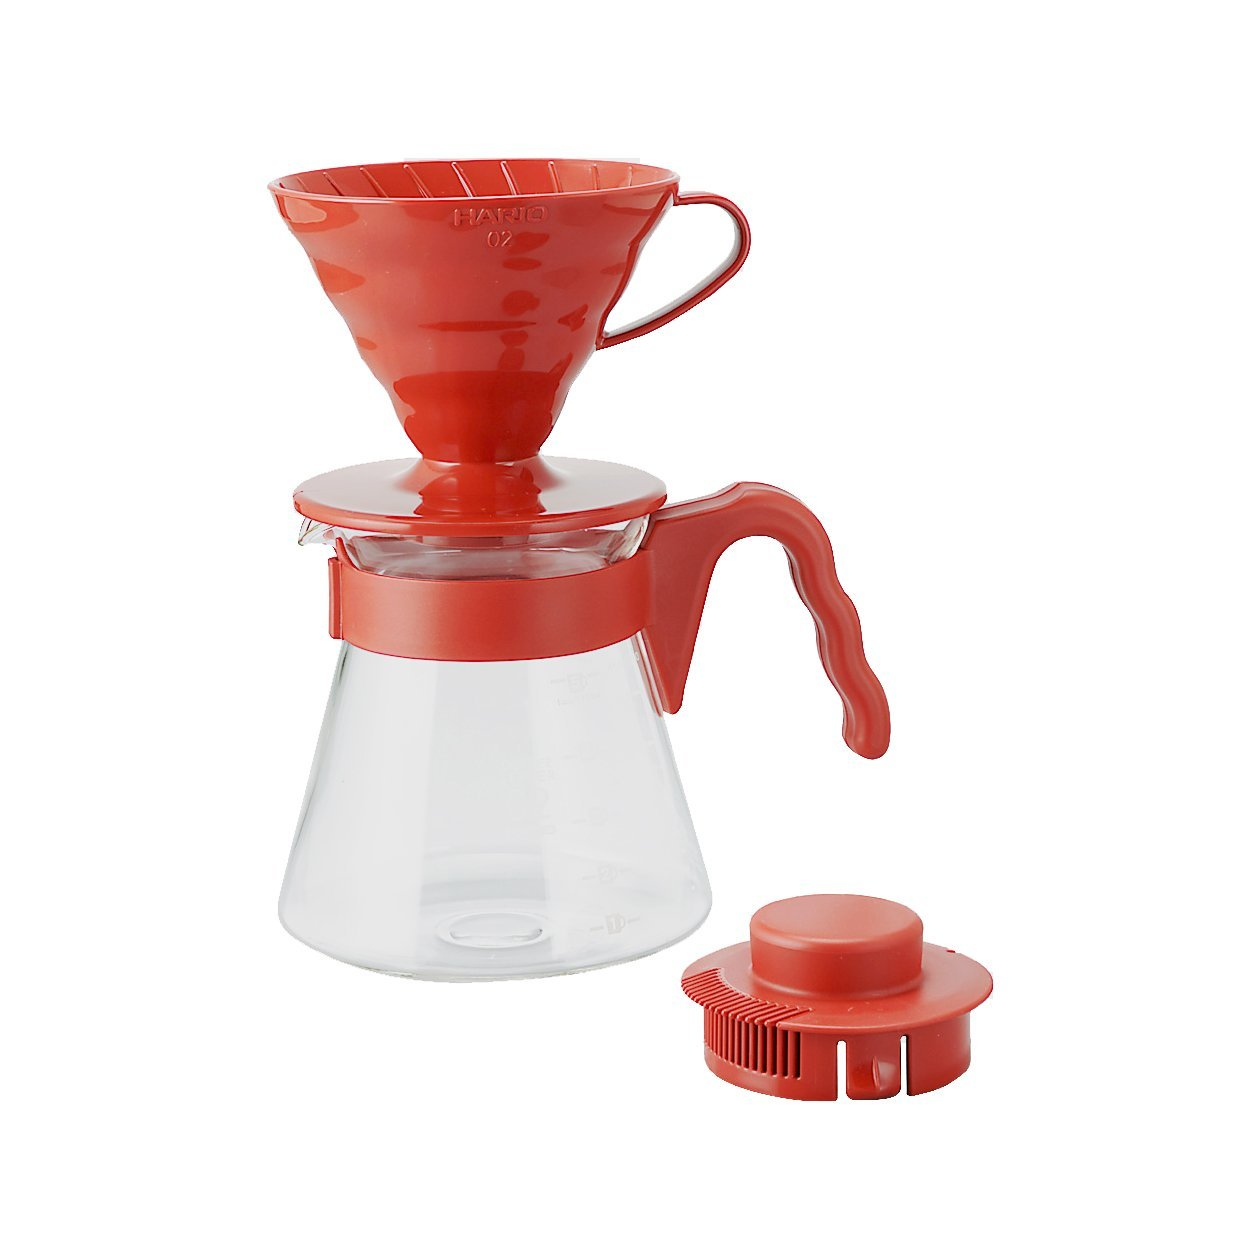 Hario อุปกรณ์ดริปกาแฟ รุ่น V60 coffee server set ขนาด 02 (สีแดง)